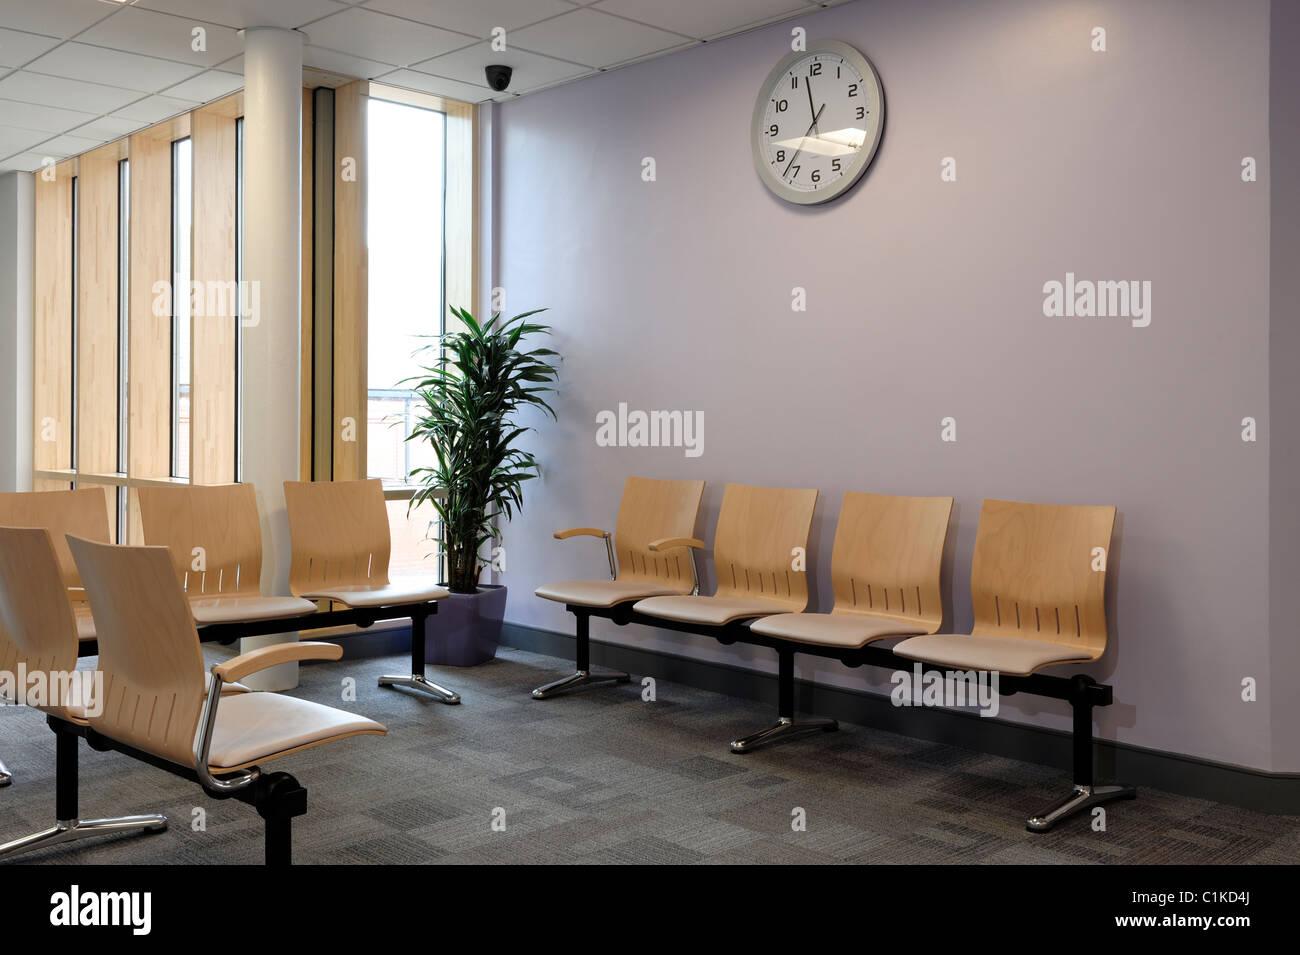 Sala de espera Imagen De Stock